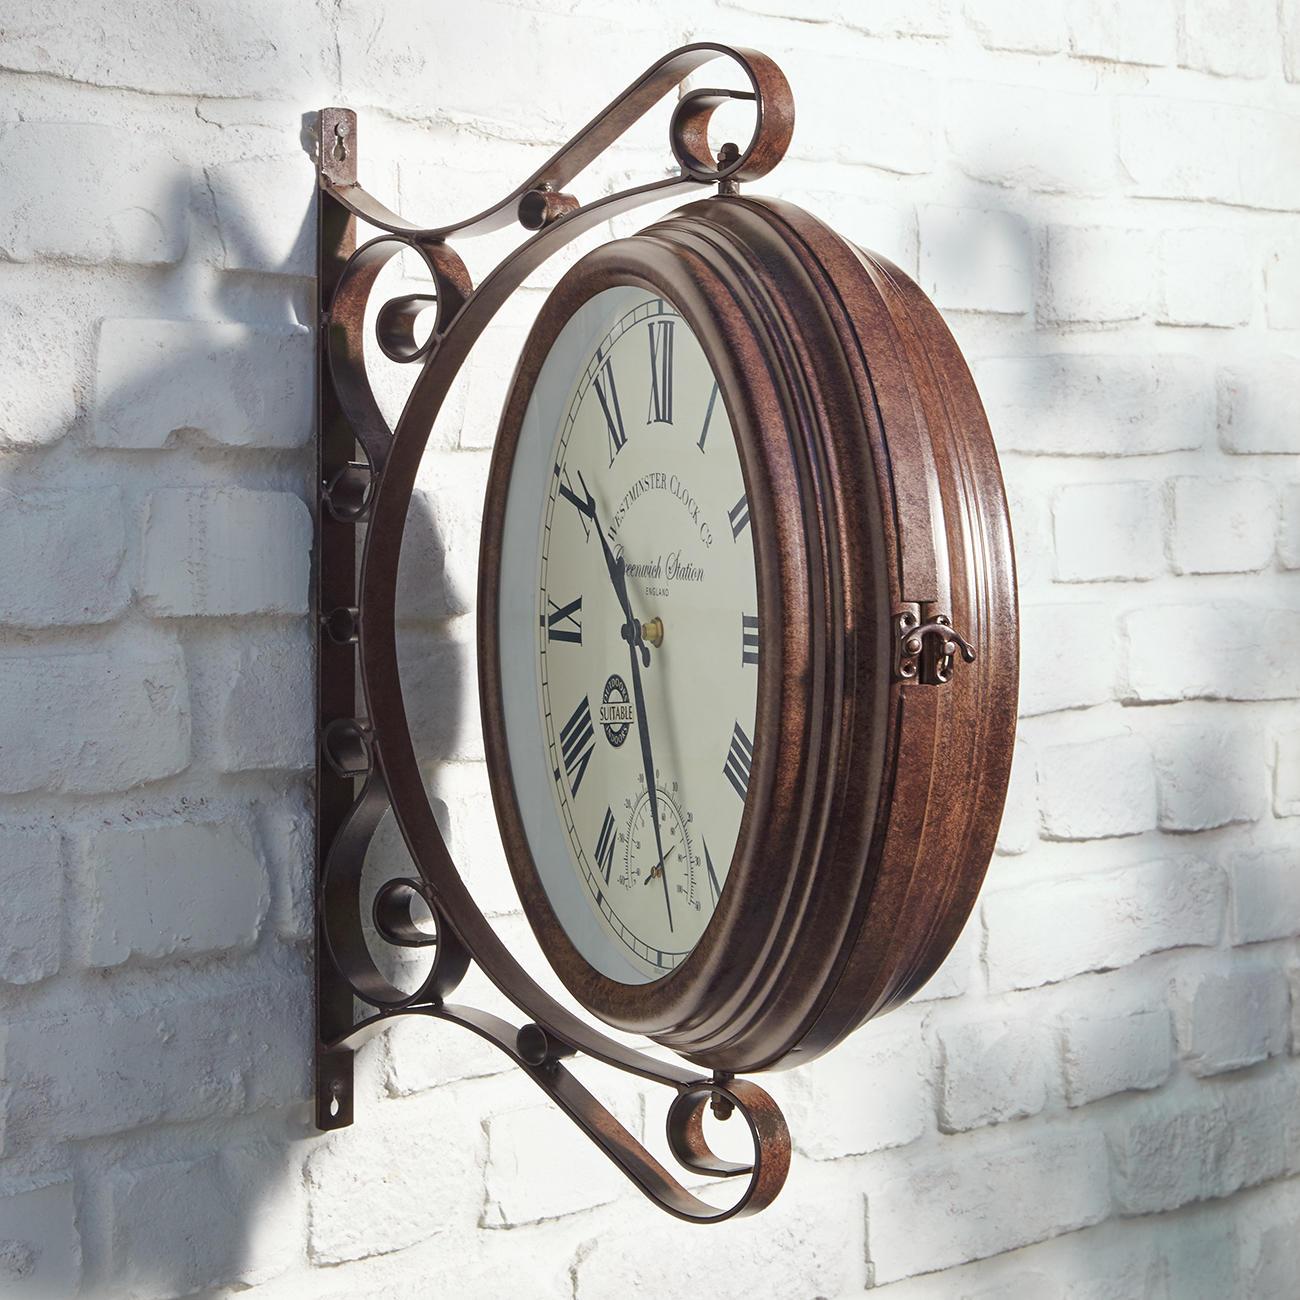 Acheter Horloge De Jardin Et De Terrasse En Ligne Pas Cher